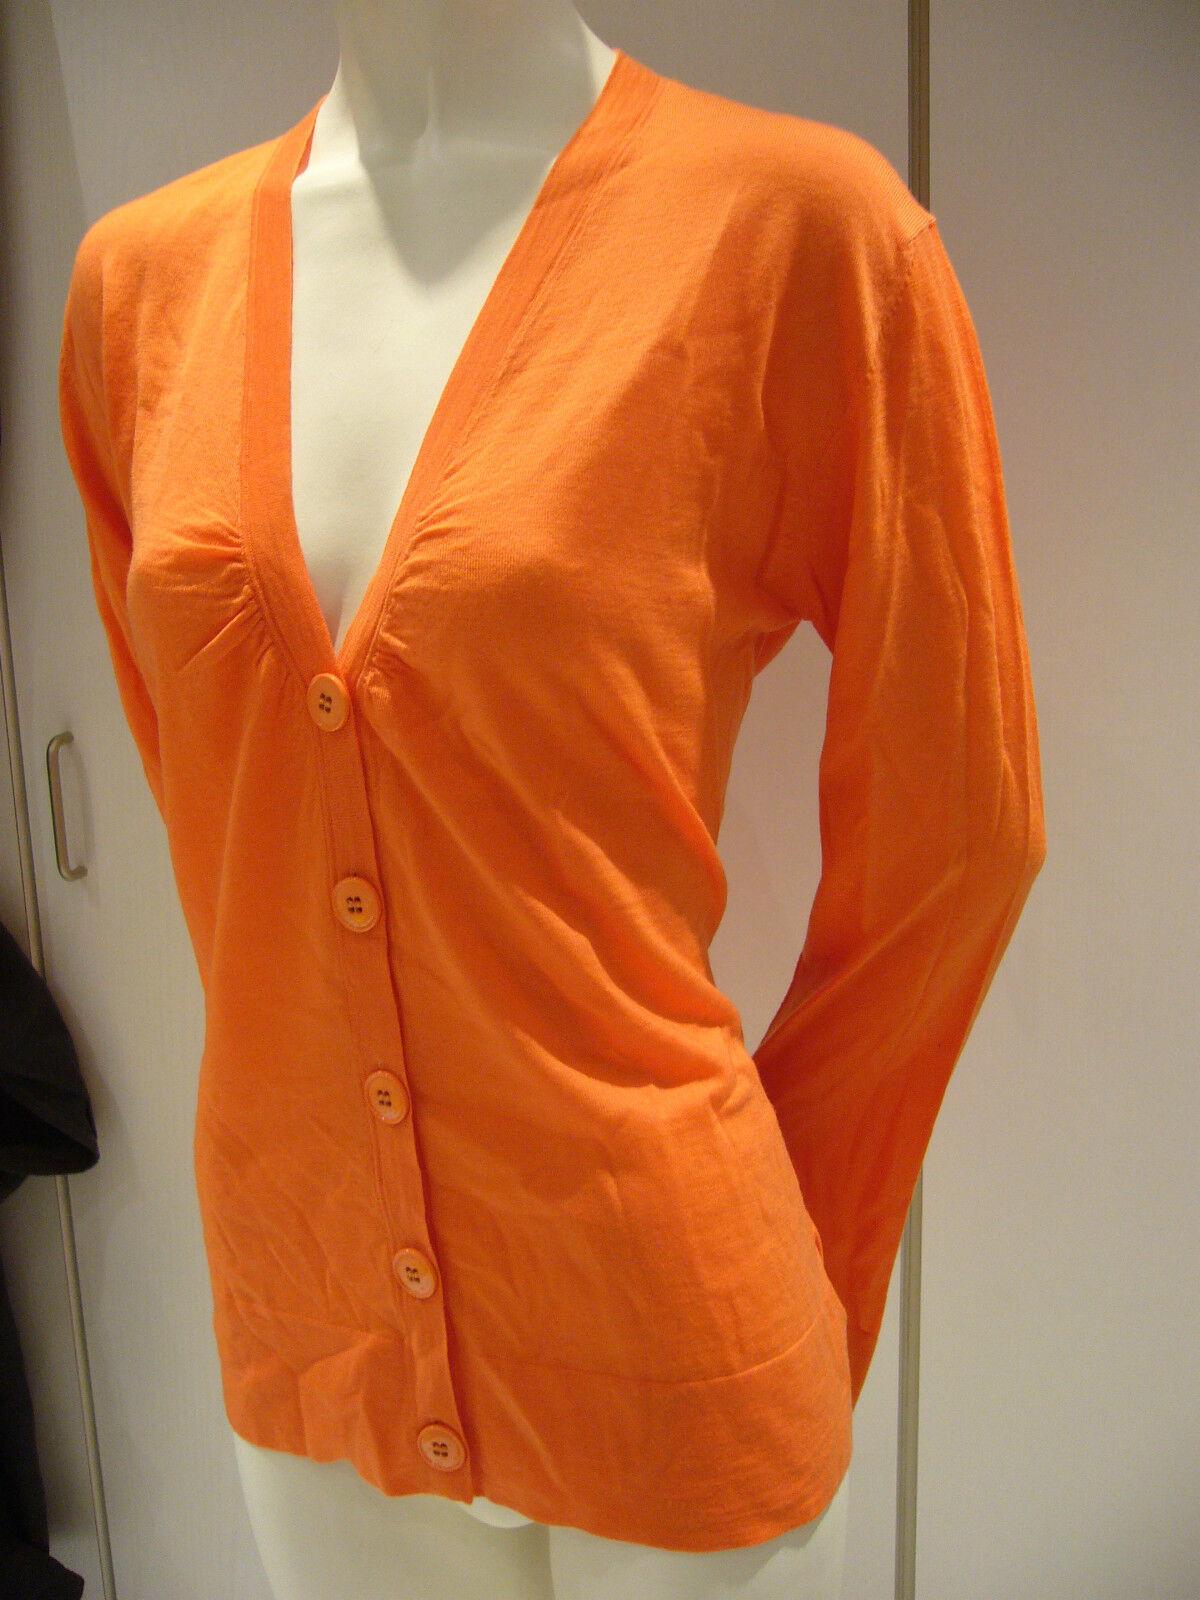 Bogner Cardigan Arancione Lana Lana Lana Vergine Tgl 40 38 UVP Nuovo e83c5f